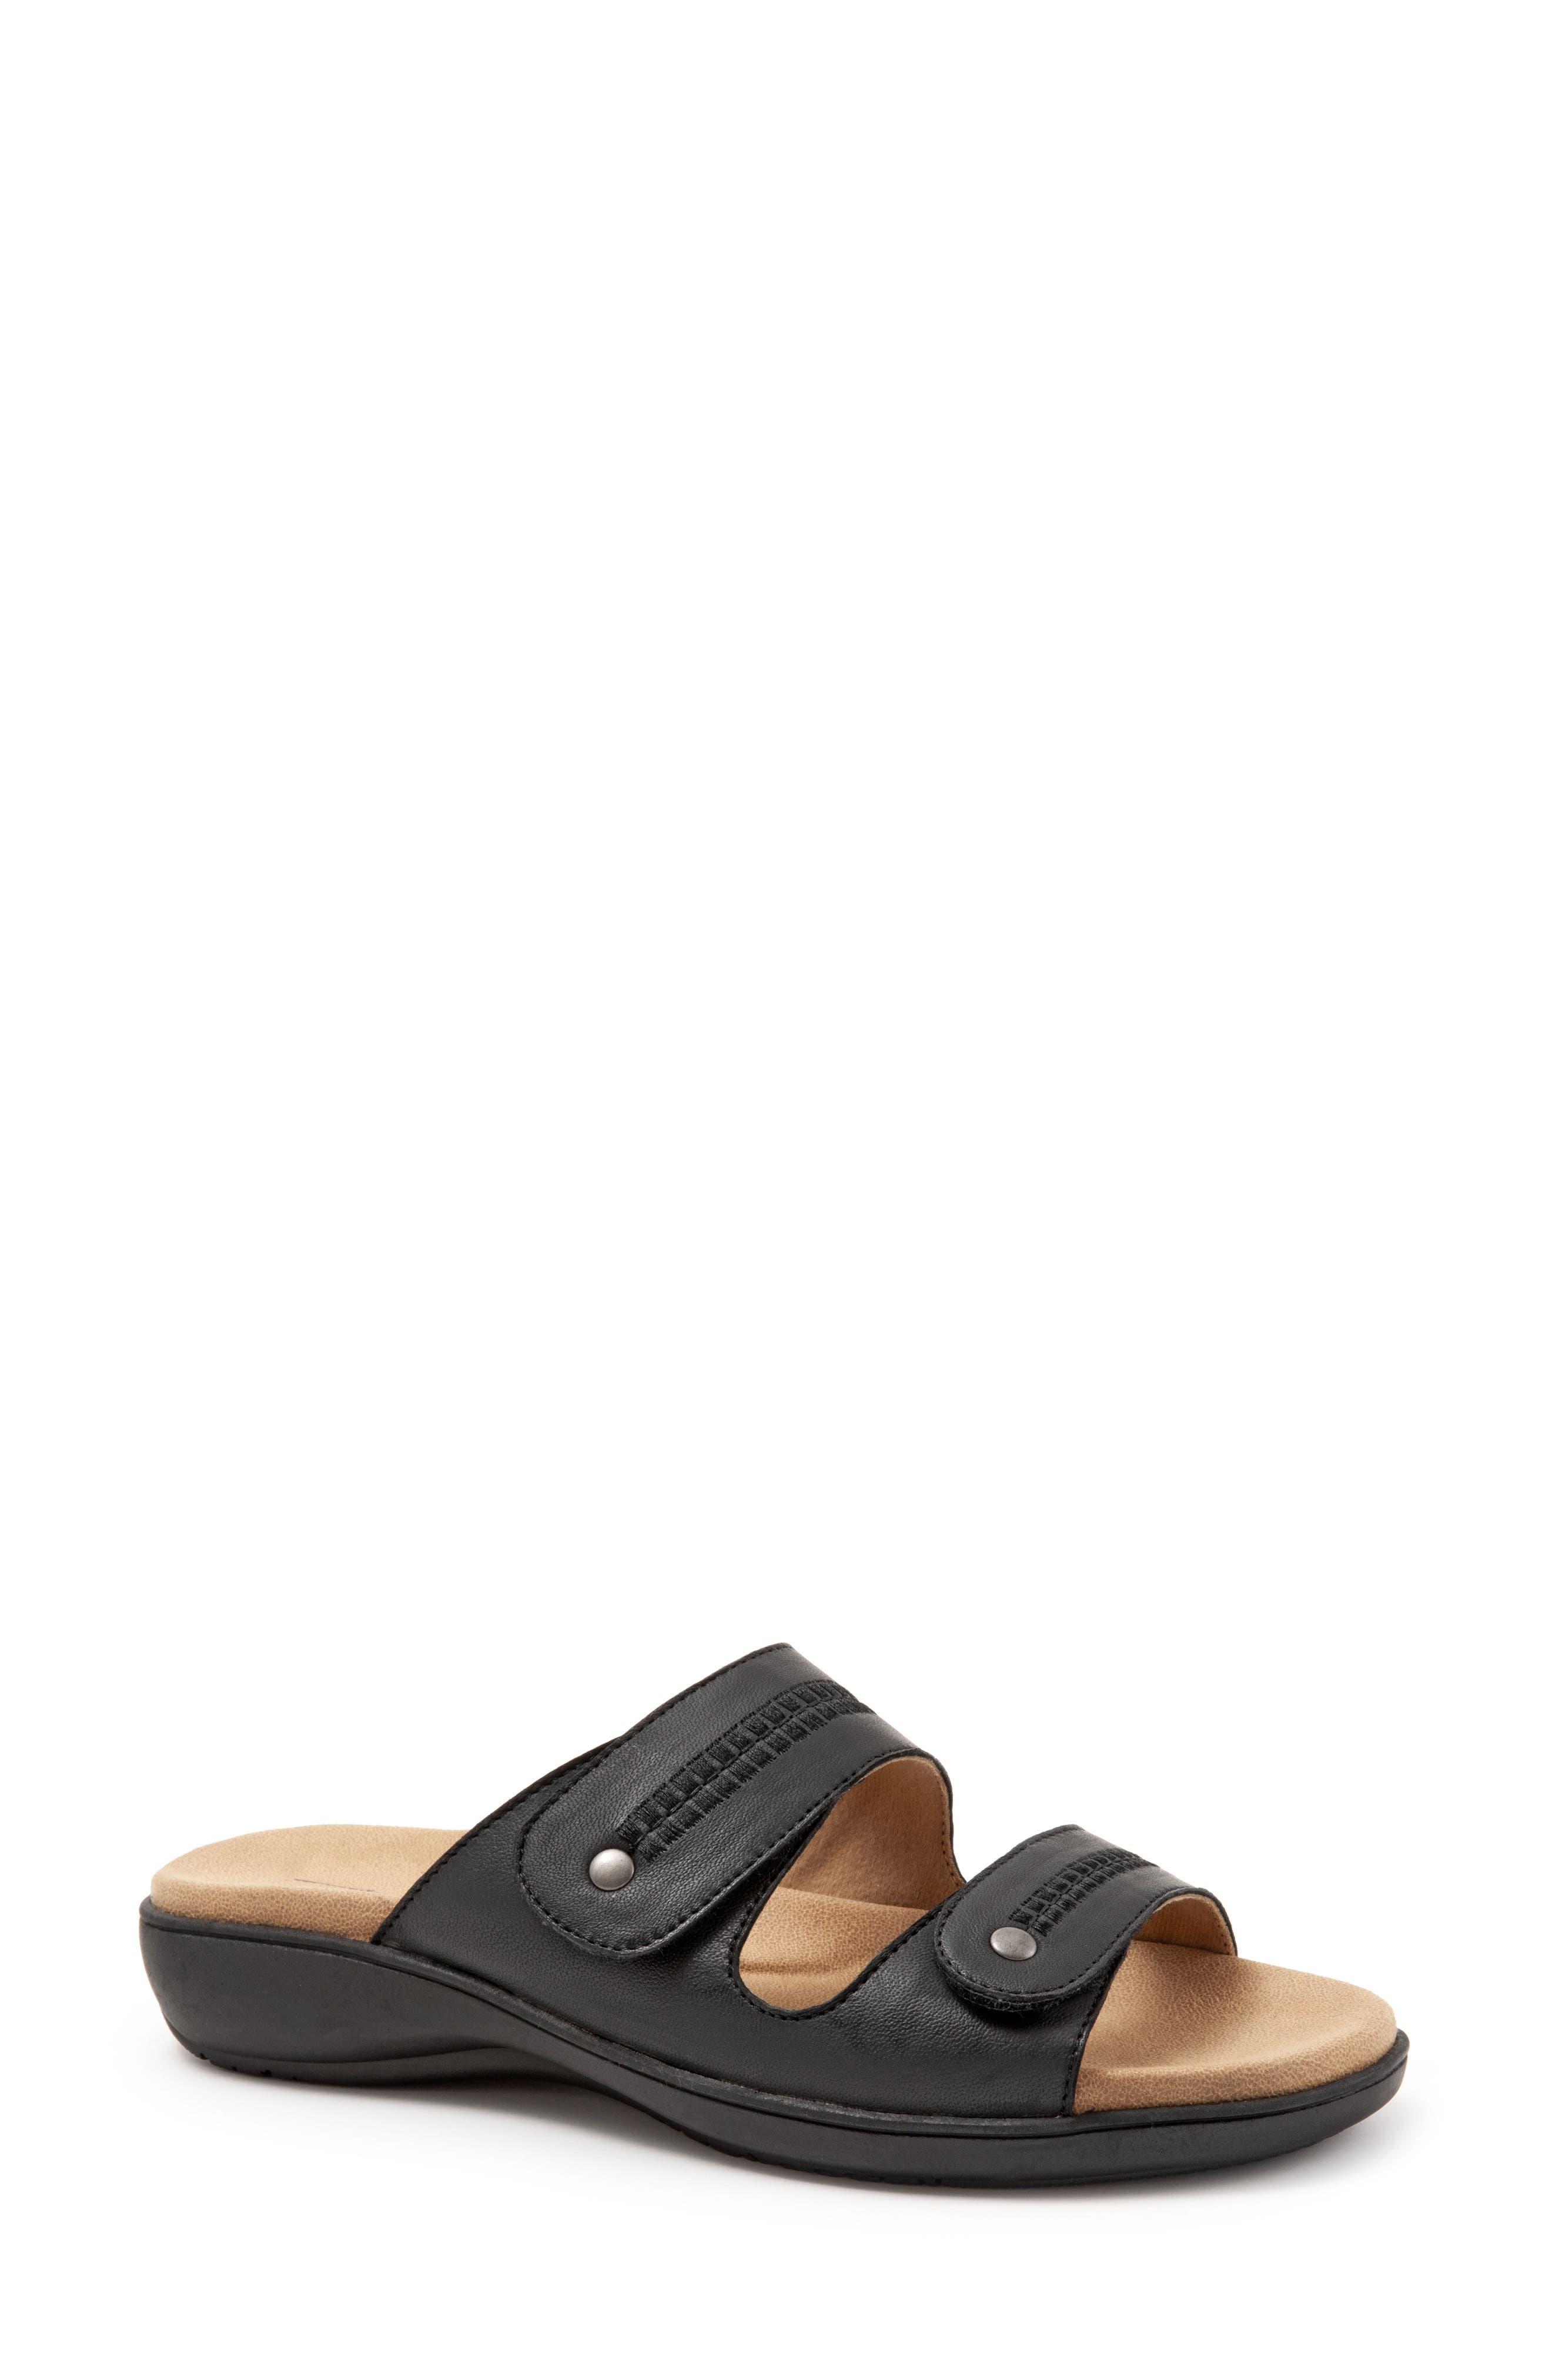 Vale Double Strap Slide Sandal, Main, color, BLACK LEATHER